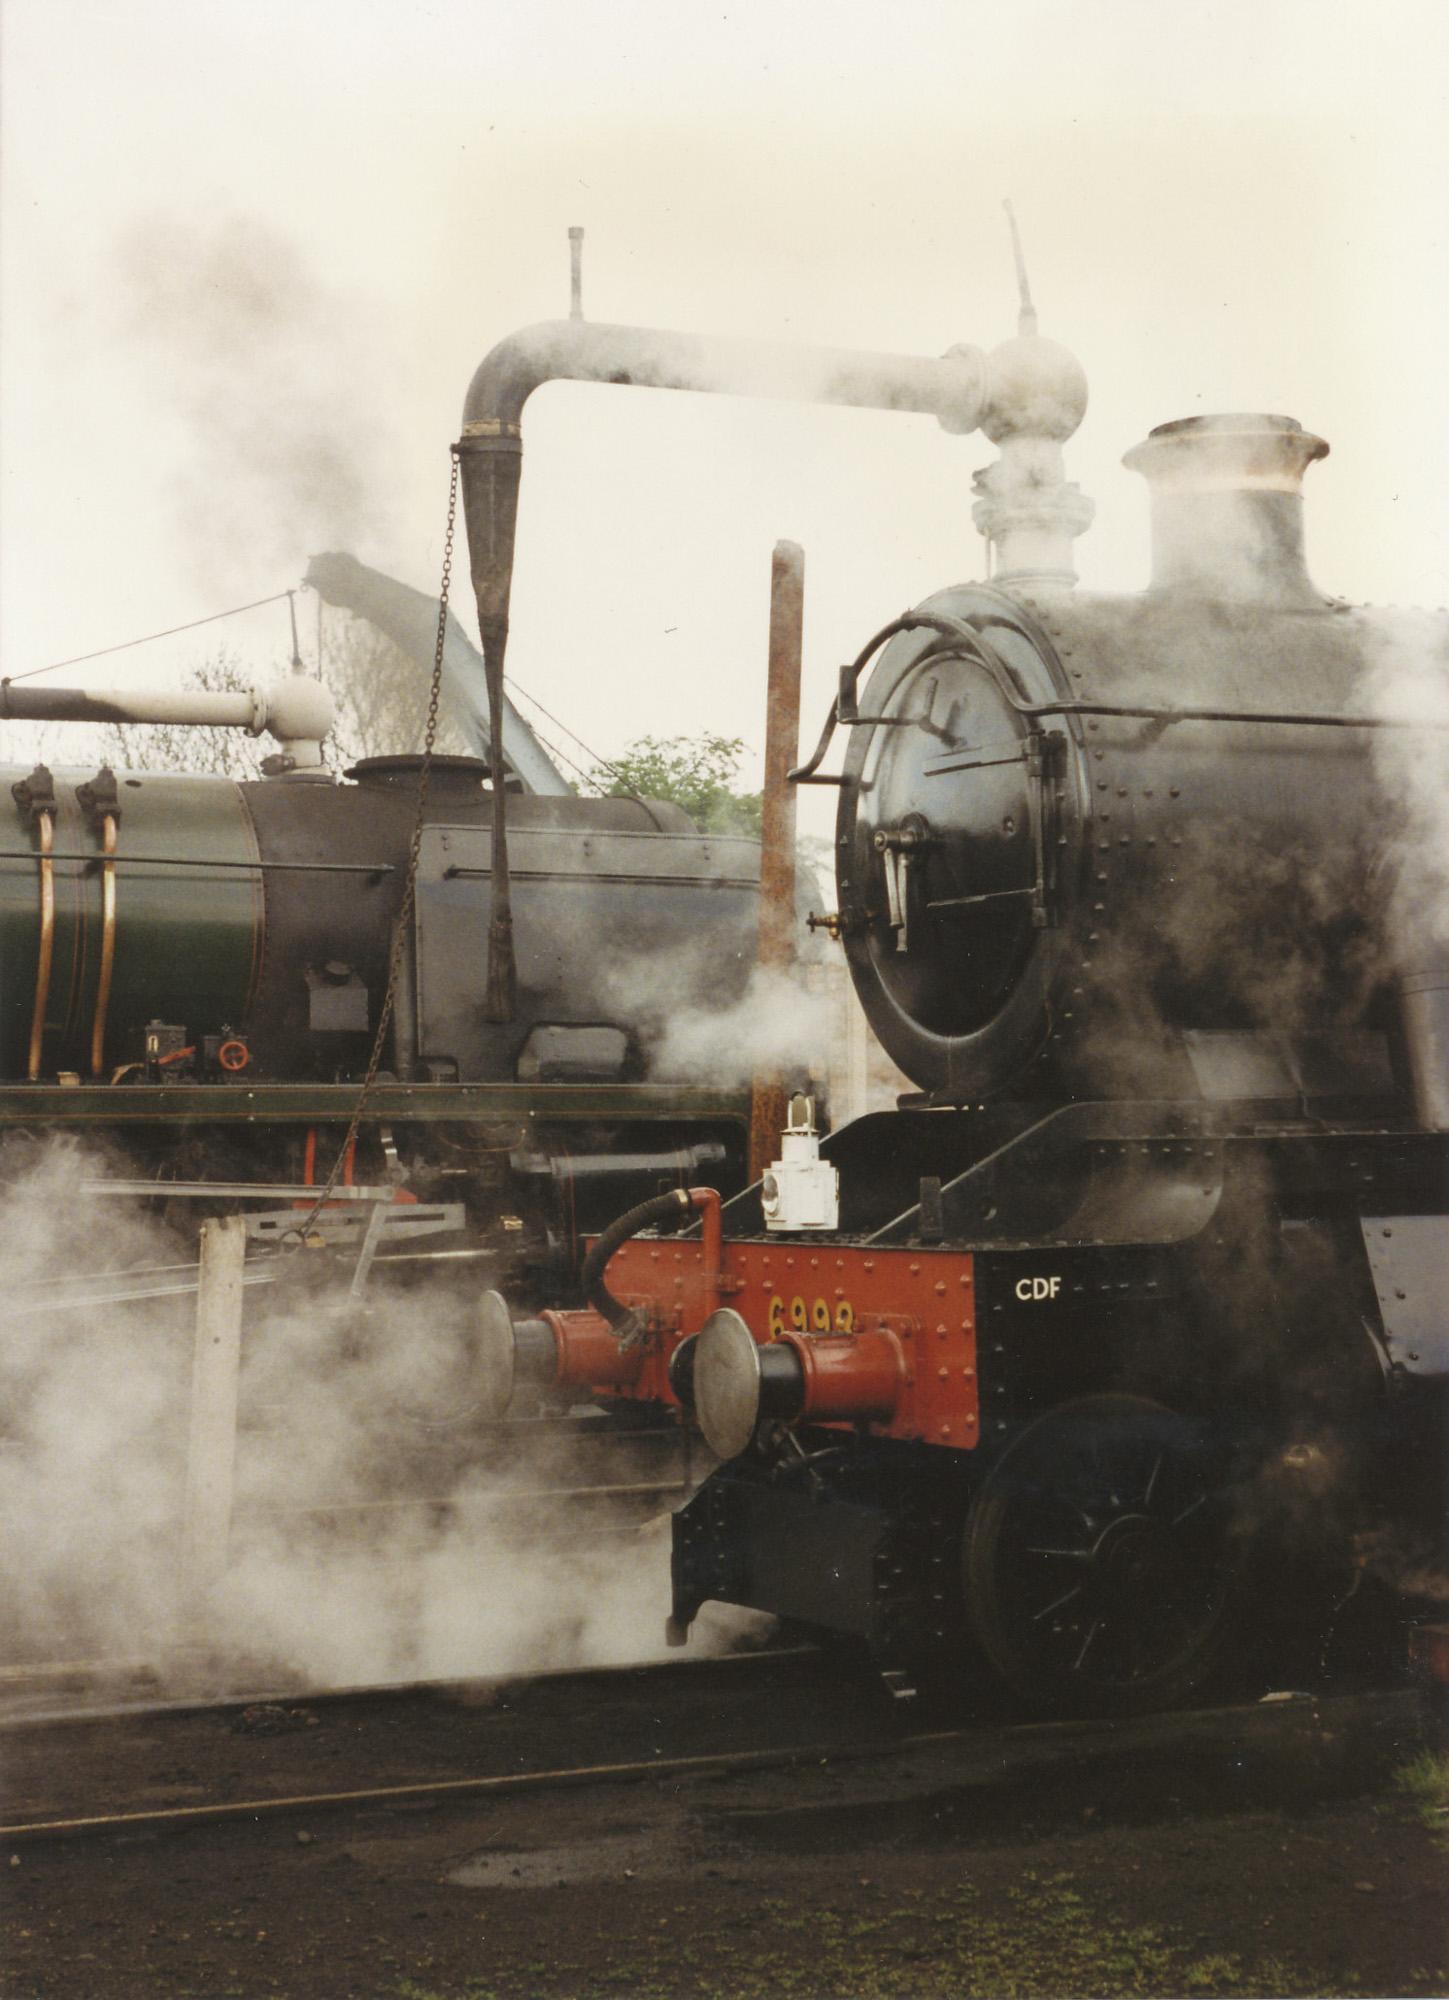 34027 Taw Valley and 6998 Burton Agnes Hall. © Bob Robson/6024 PS Ltd